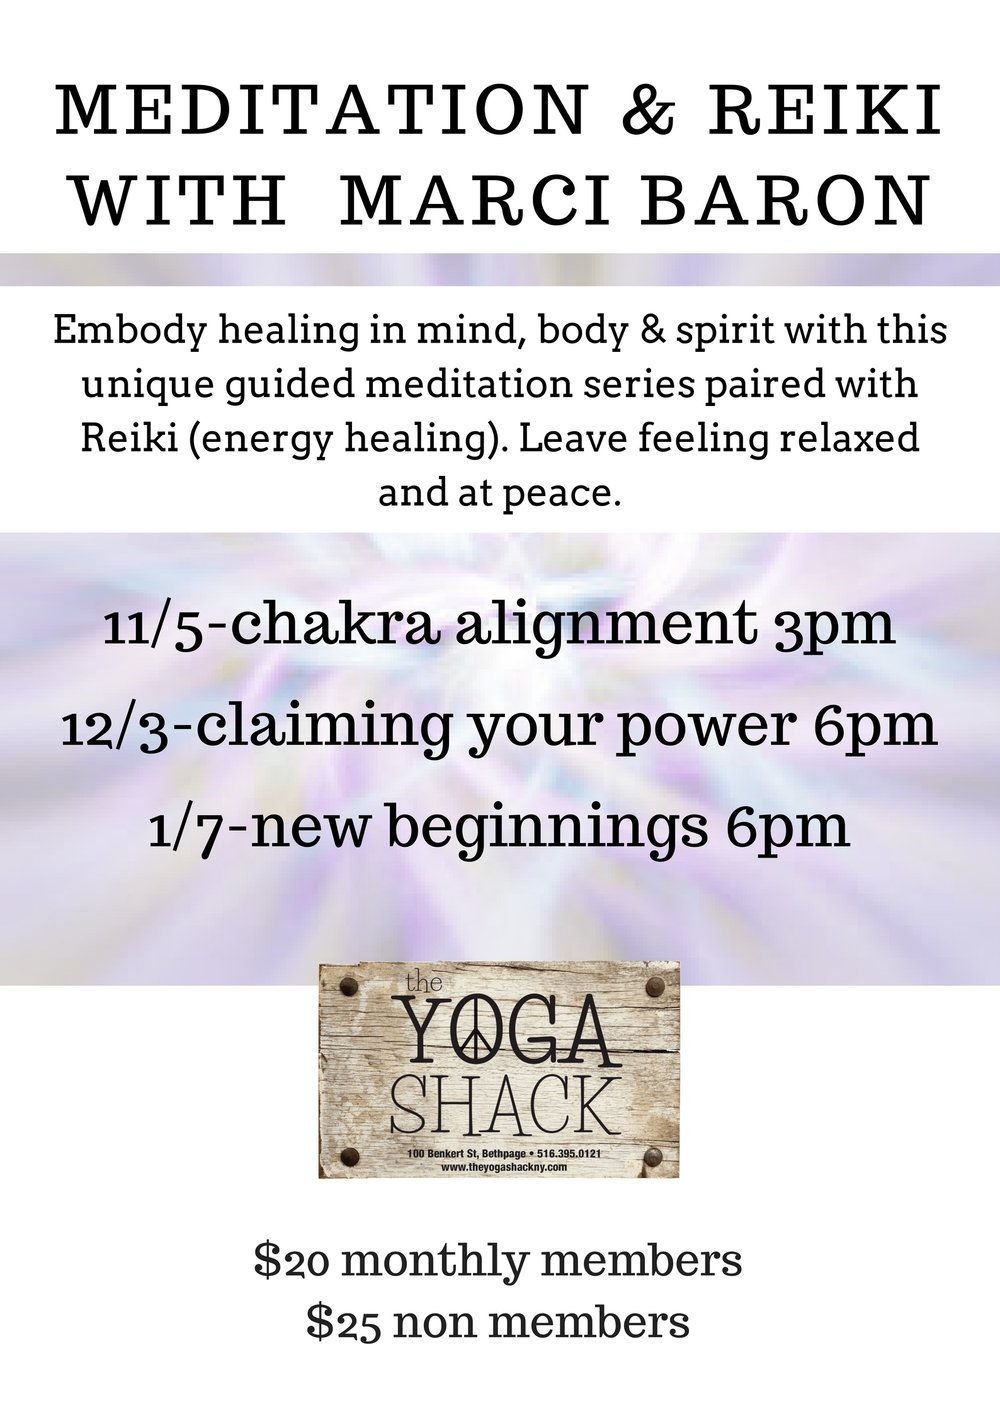 Meditation & Reiki with marci baron (1).jpg